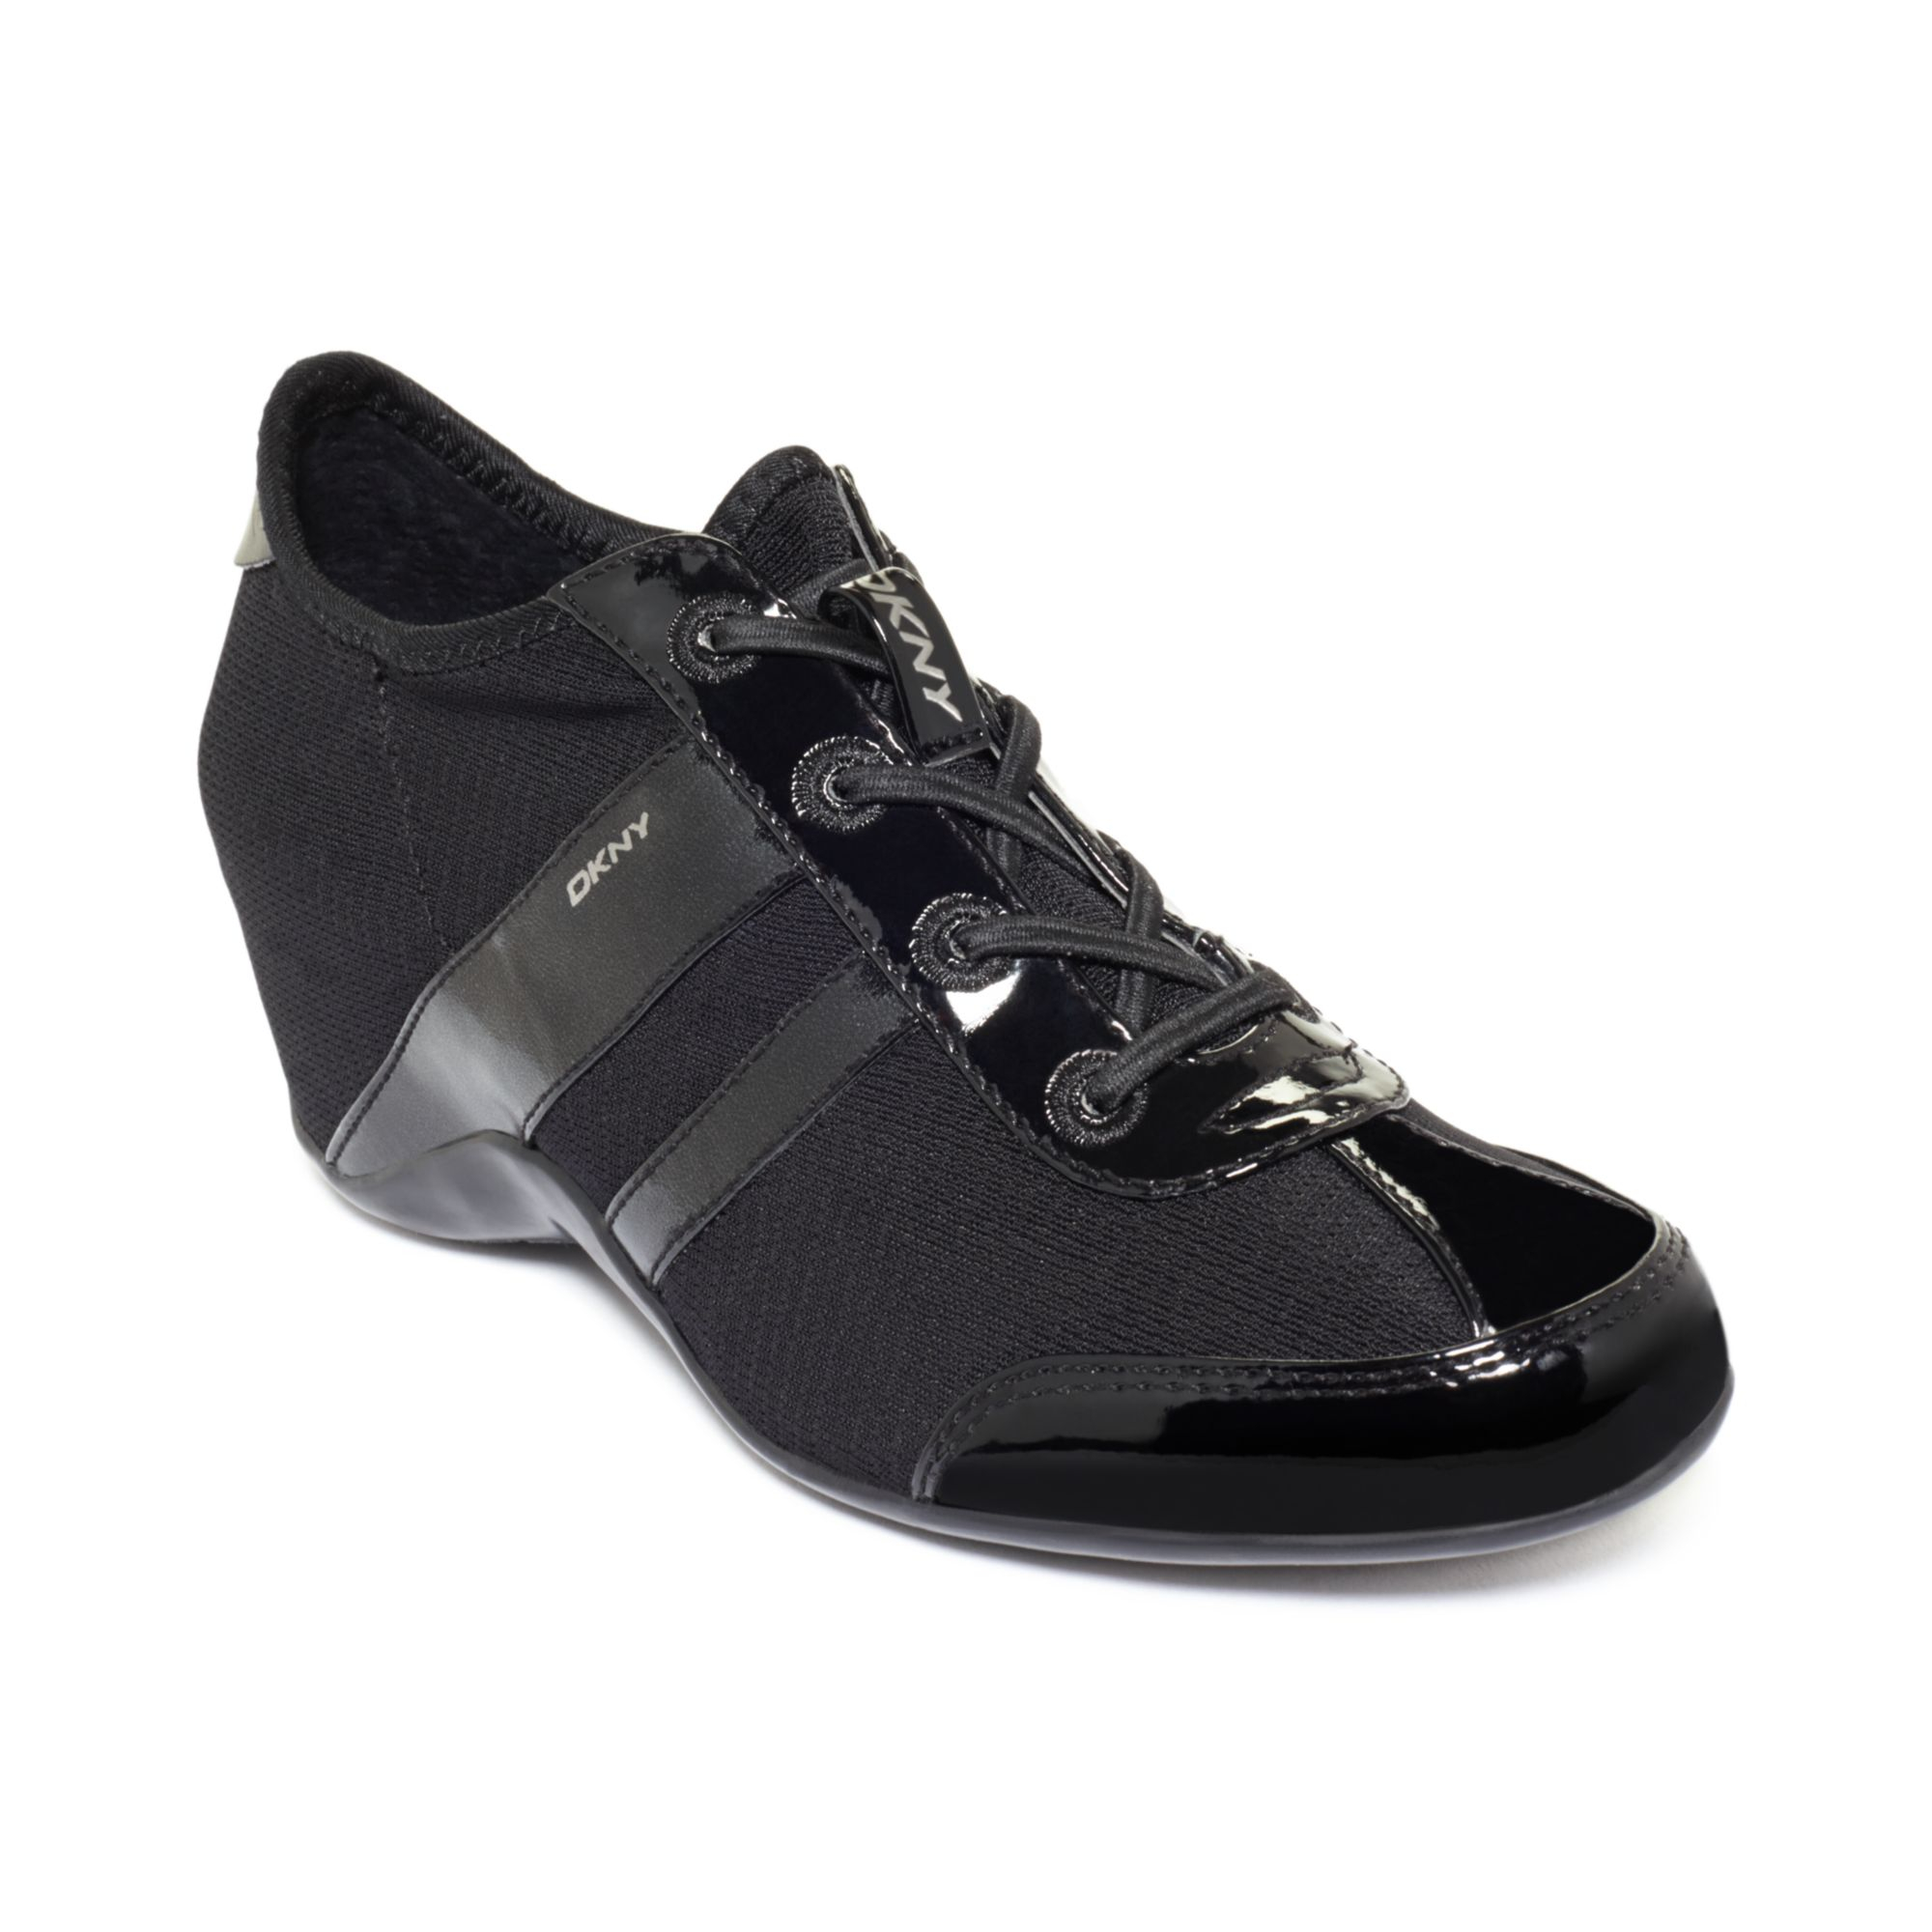 Dkny Shoes Heels